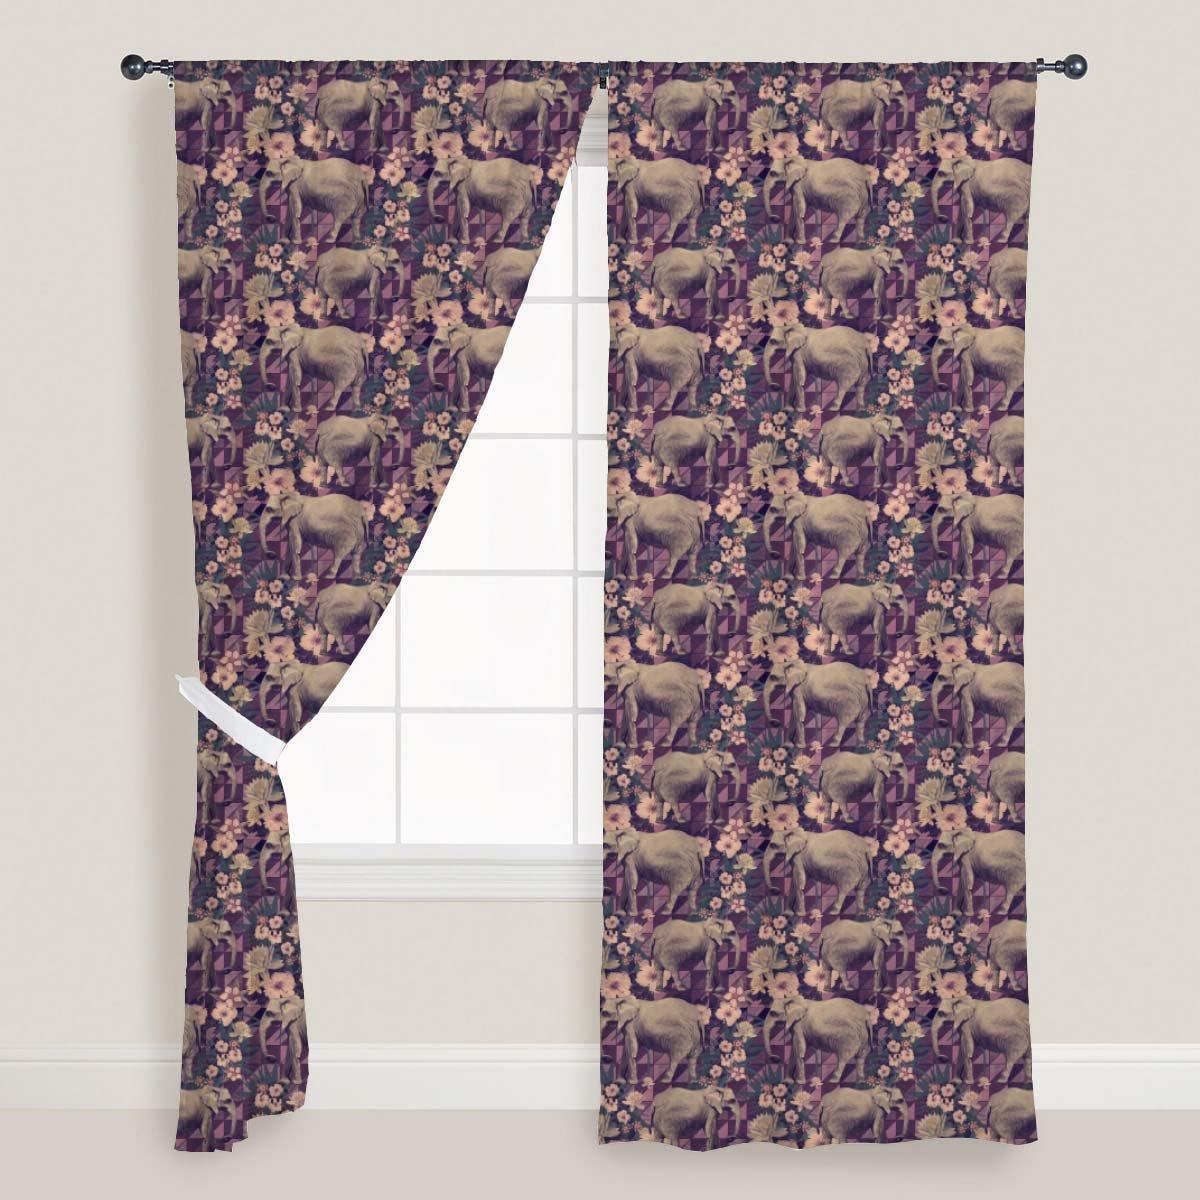 ArtzFolio AZ Indian Elephants Door  Window Curtain Satin 4feet x 7feet; Set of 3 PCS